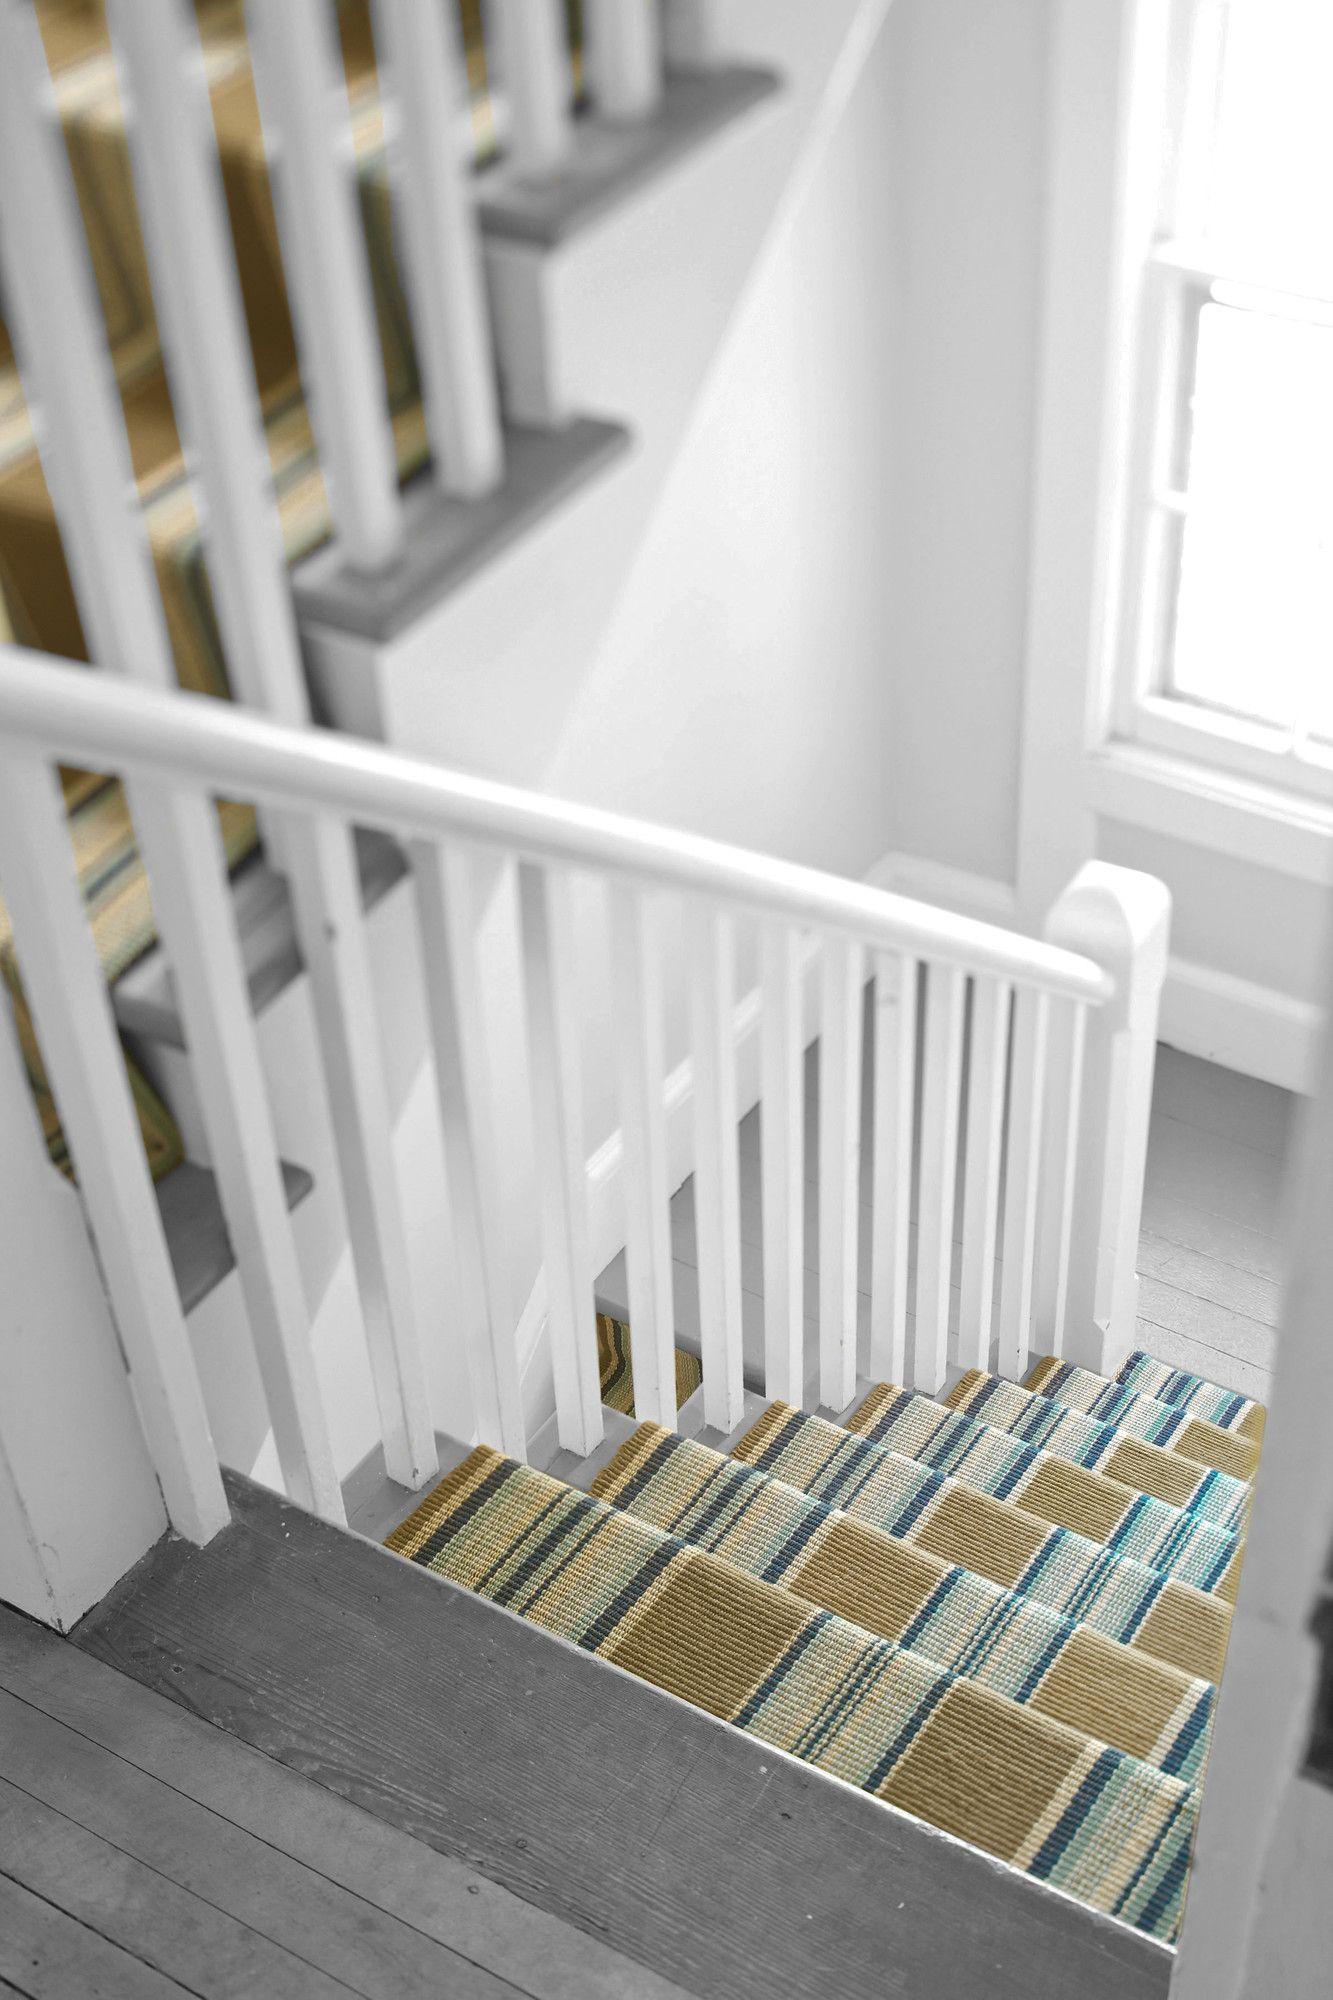 Flat Woven Blue Area Rug Striped Stair Runner Hallway Carpet | Wayfair Carpet Runners For Stairs | Tucker Murphy | Brown Beige | Hallway Carpet | Wool Rug | Wall Carpet